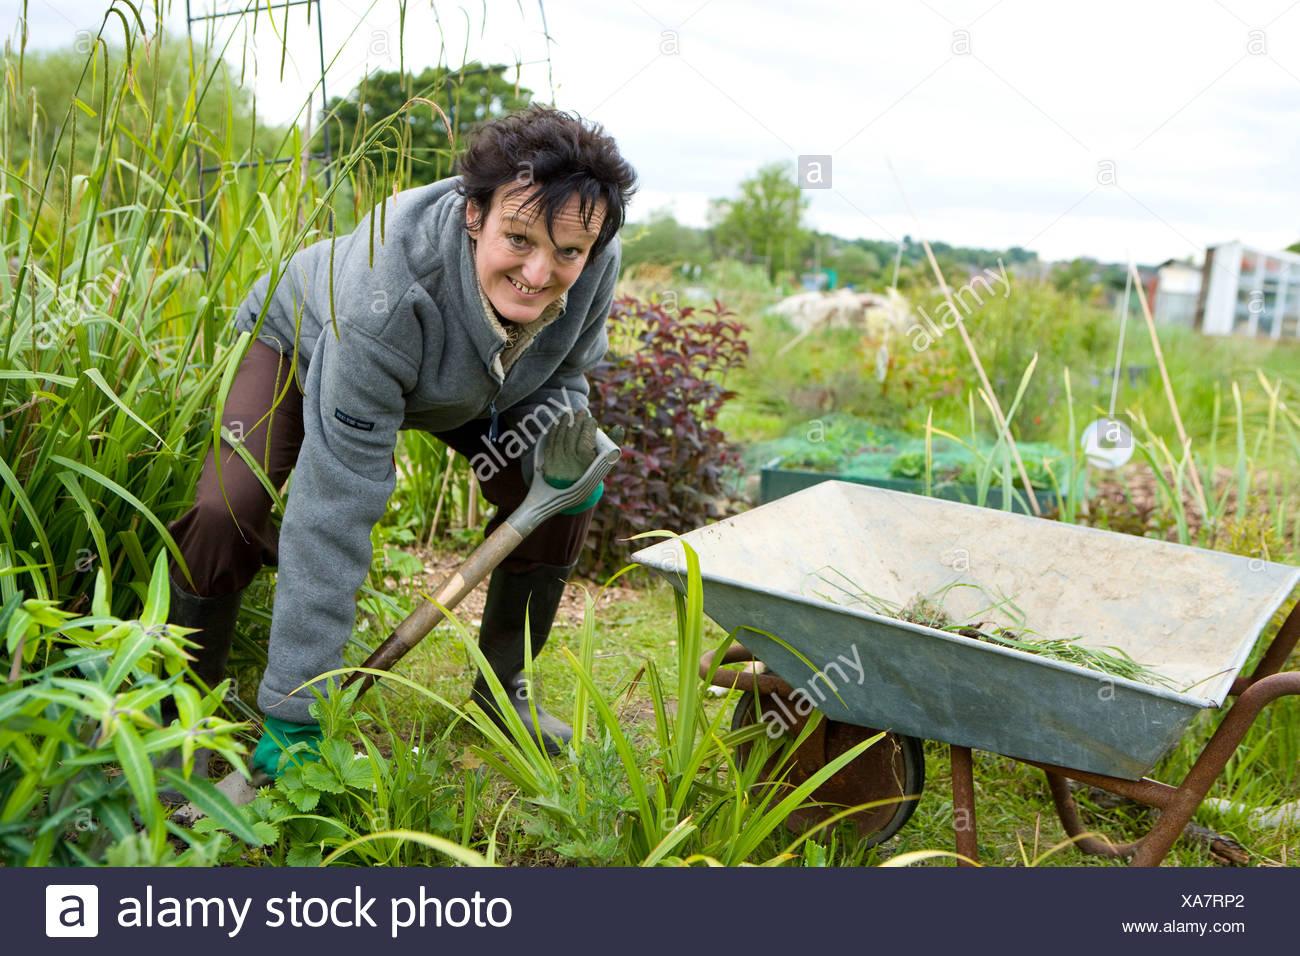 lady gardener digging in her allotment plot - Stock Image